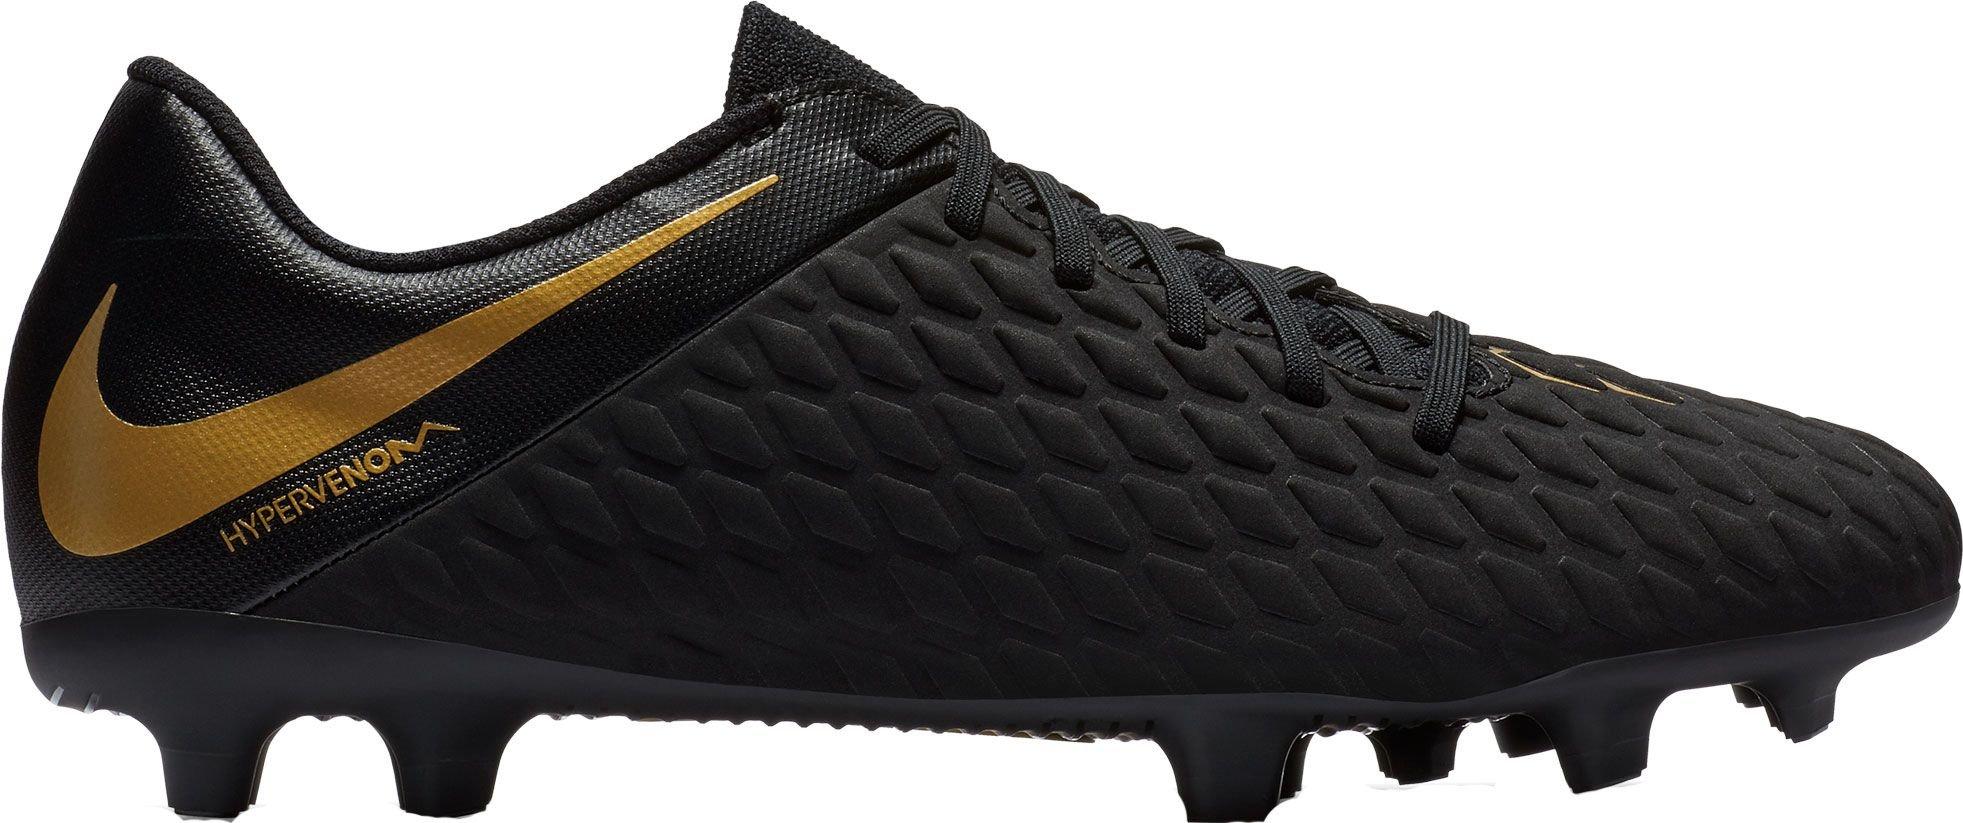 NIKE Phantom 3 Club FG Soccer Cleats (7.5, Black/Gold)